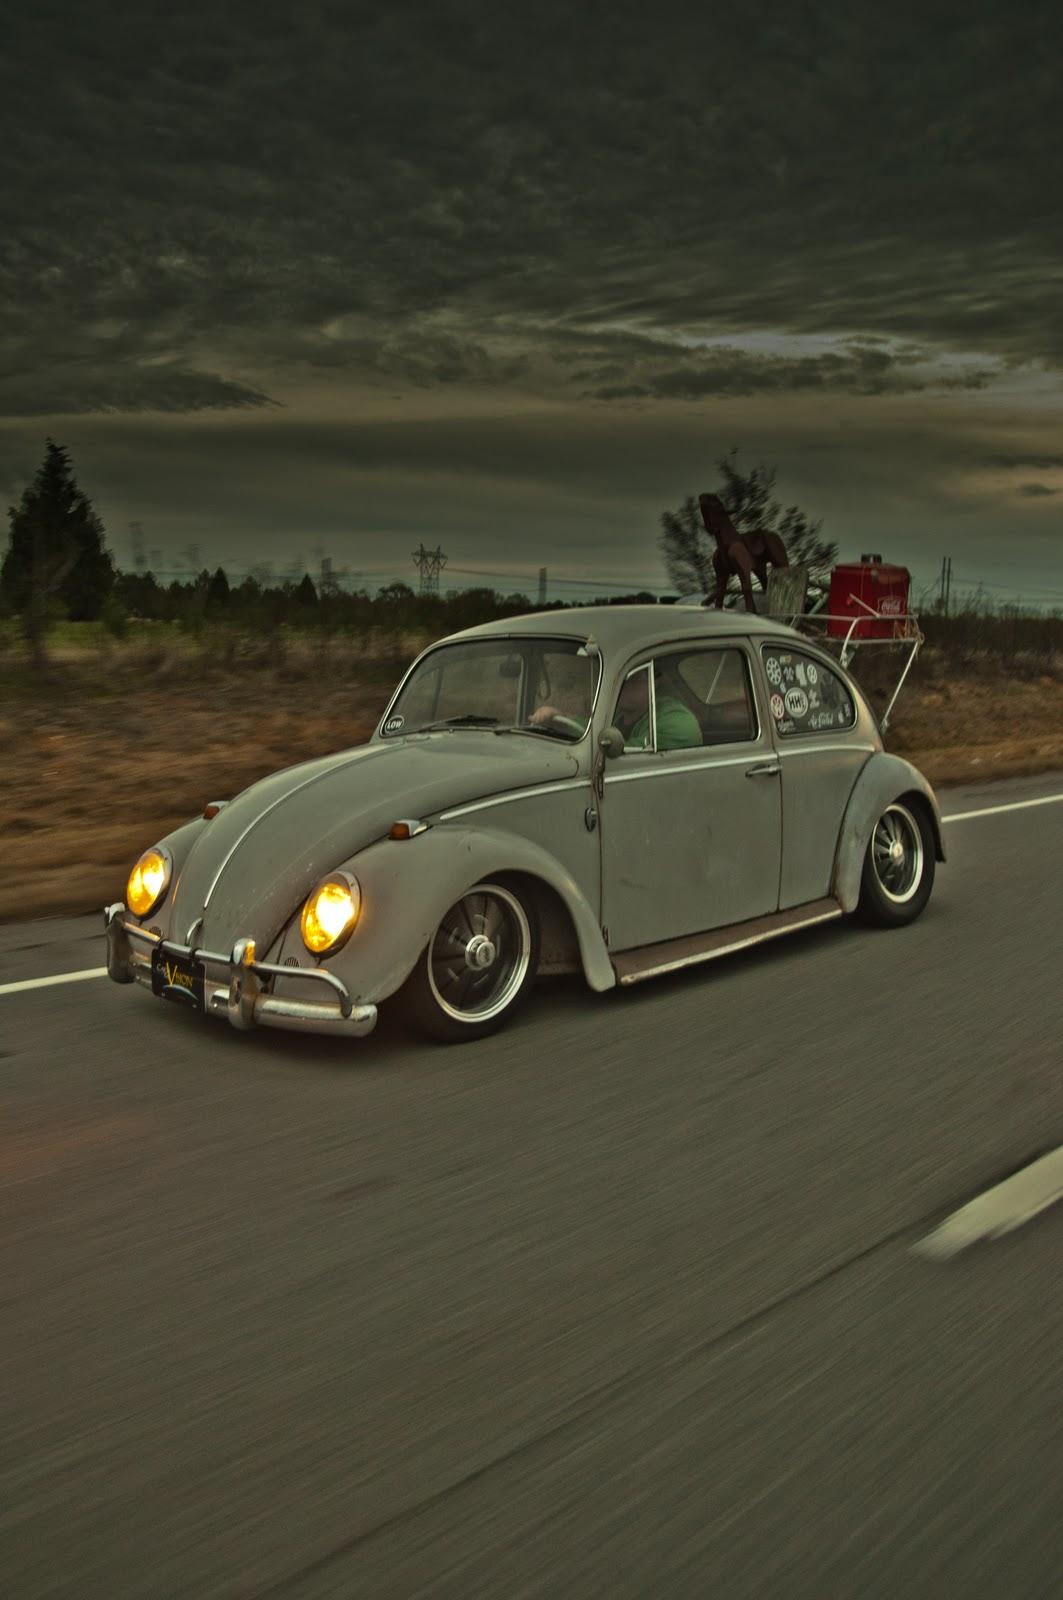 Otis - my '65 Beetle DSC_0005-4